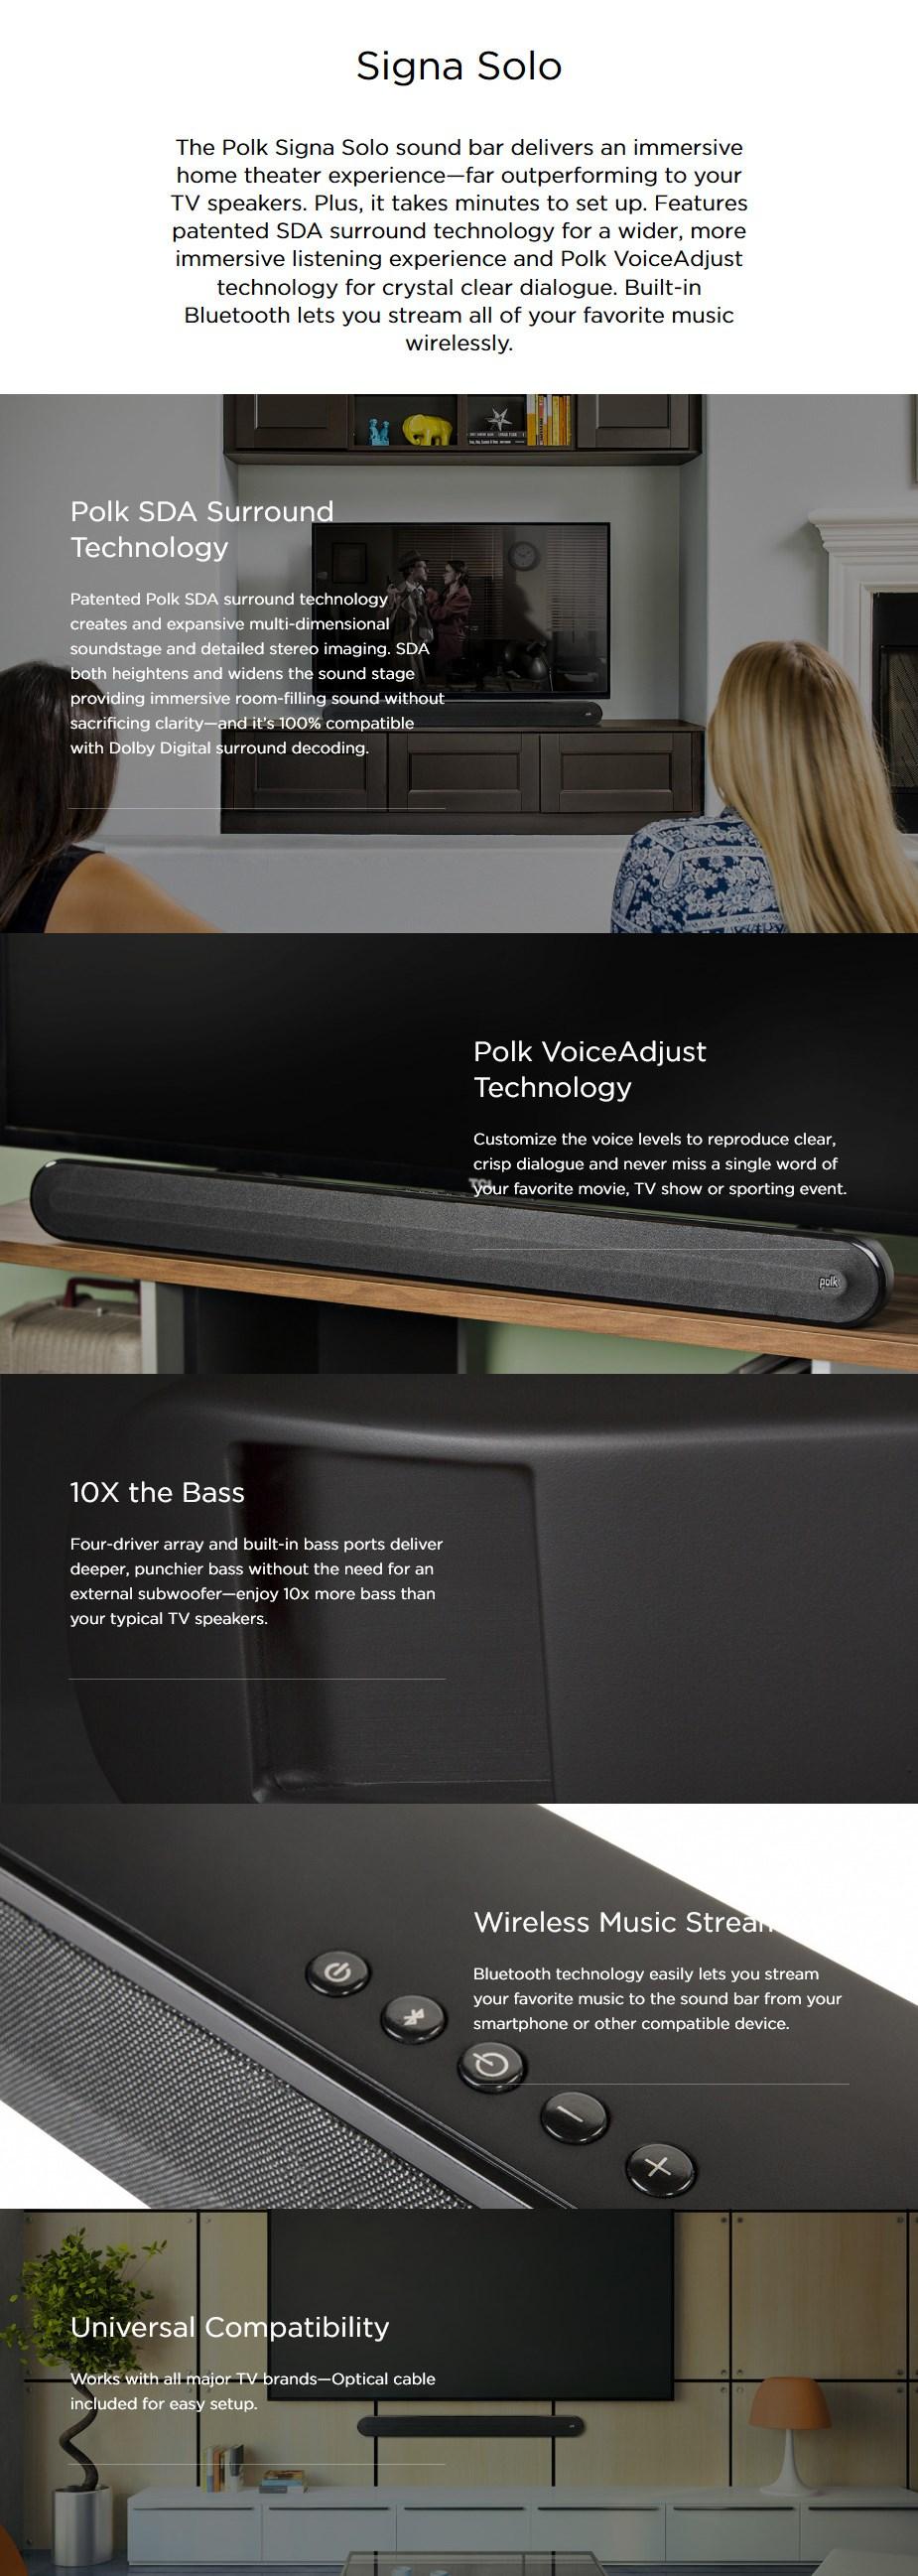 Polk Signa Solo Home Theater Bluetooth Sound Bar - Desktop Overview 1